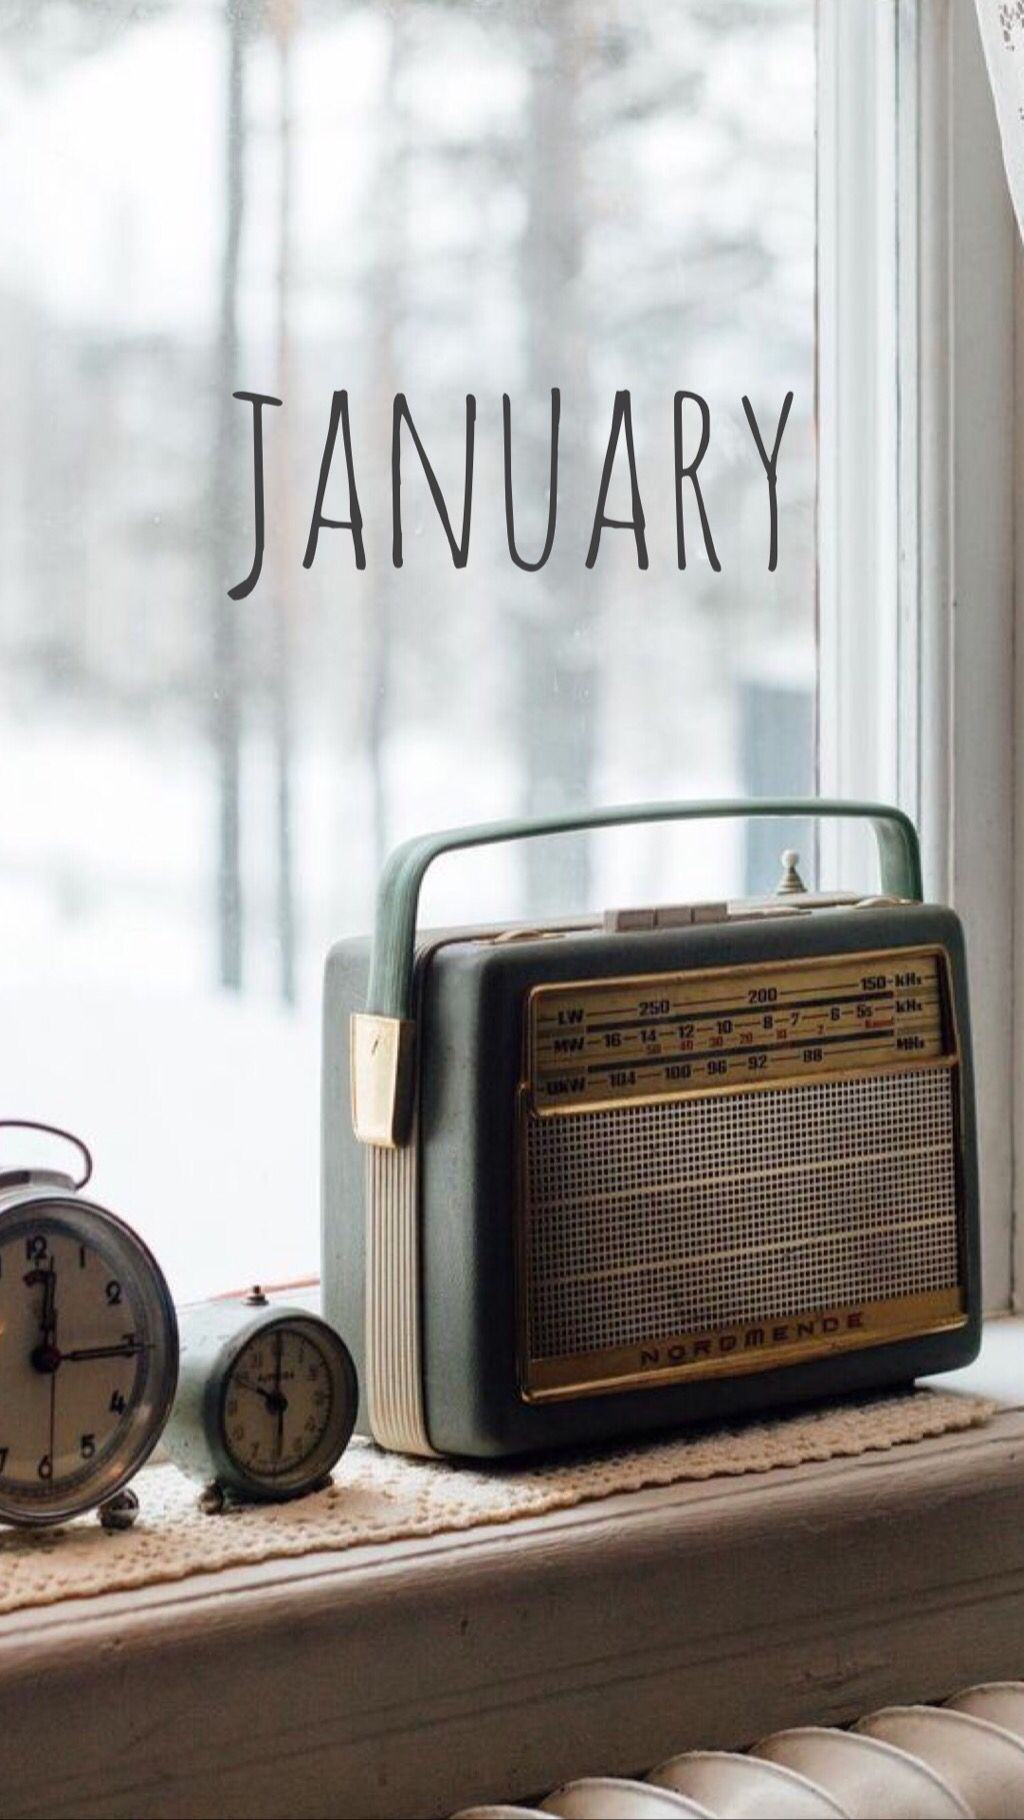 January Wallpaper Januarywallpaper In 2020 January Wallpaper Iphone Wallpaper Winter Wallpaper